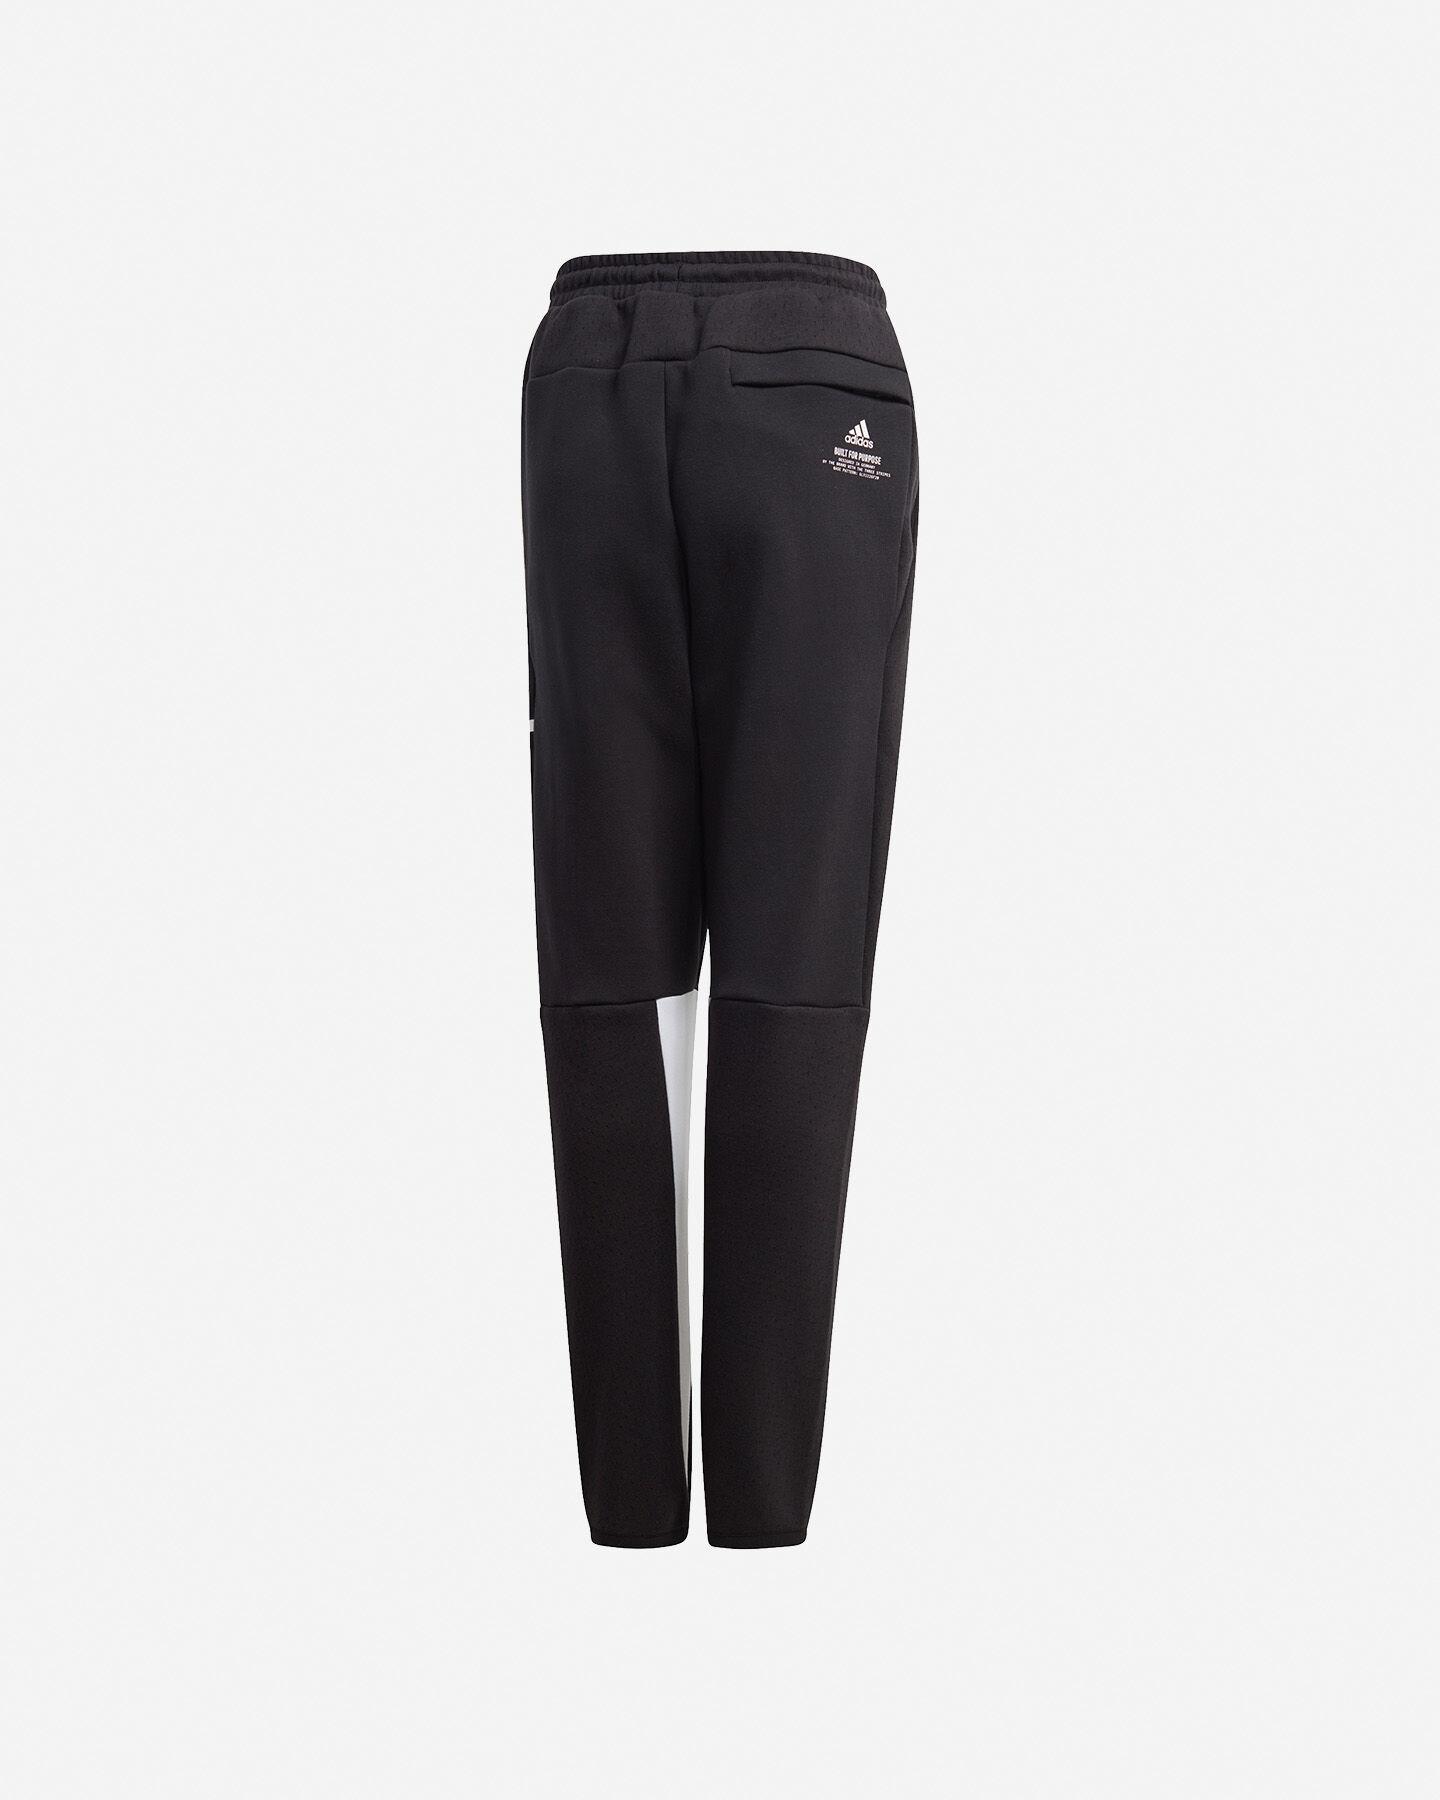 Pantalone ADIDAS ZONE  JR S5228126 scatto 1